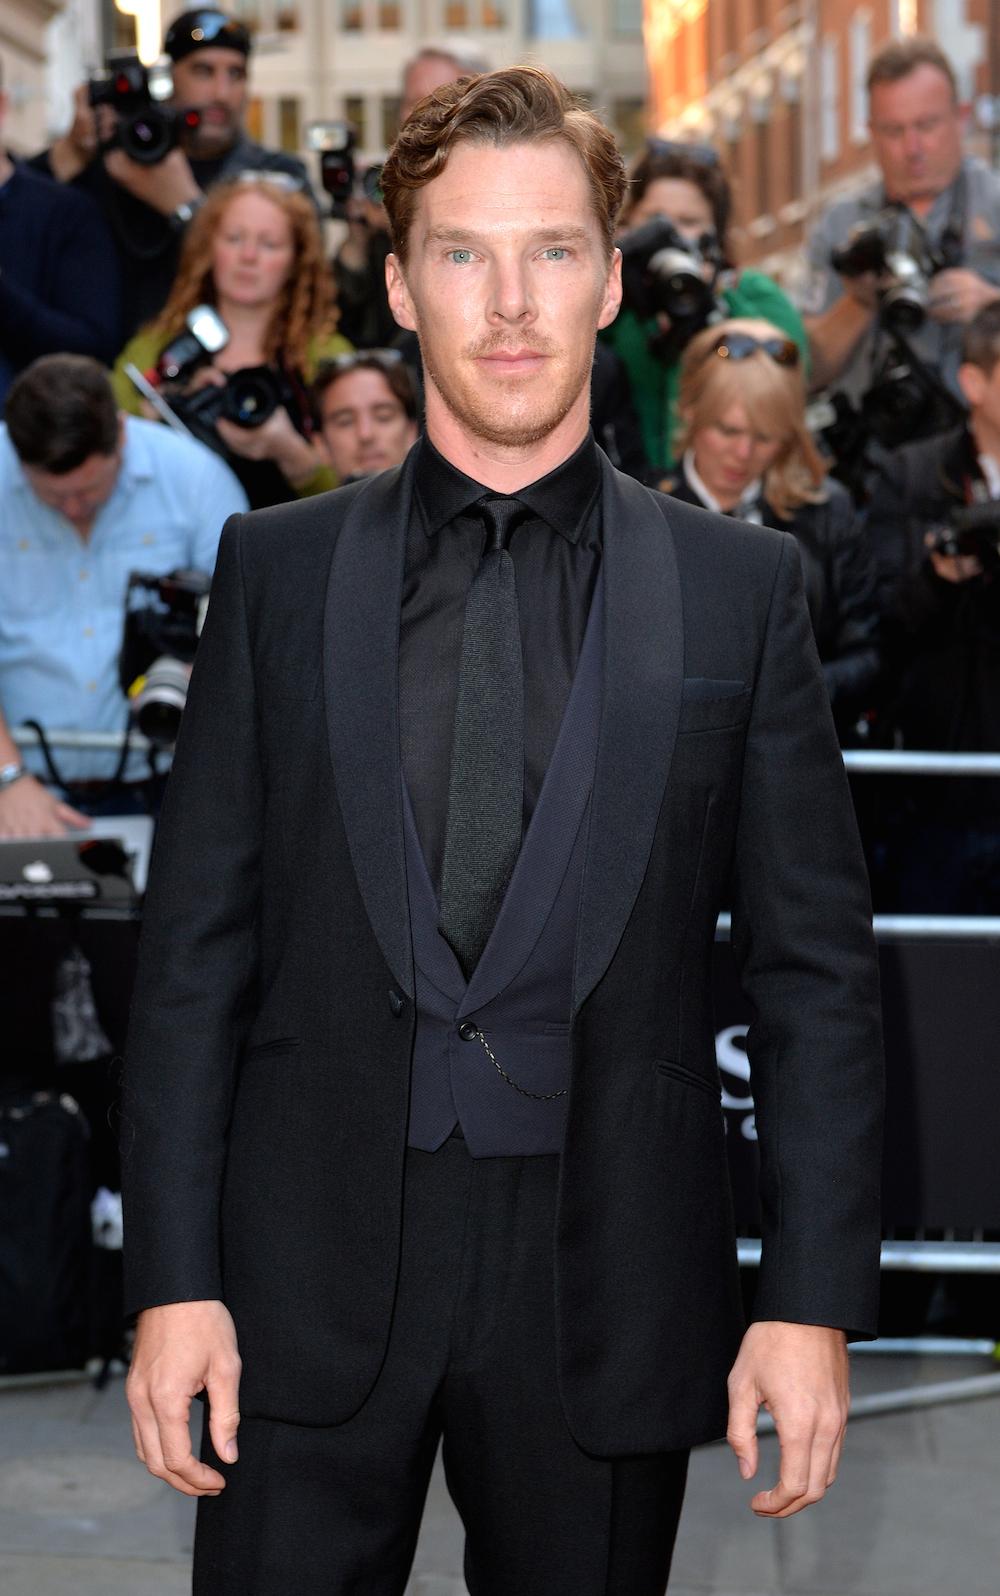 Benedict Cumberbatch - GQ Men Of The Year Awards - Red Carpet Arrivals